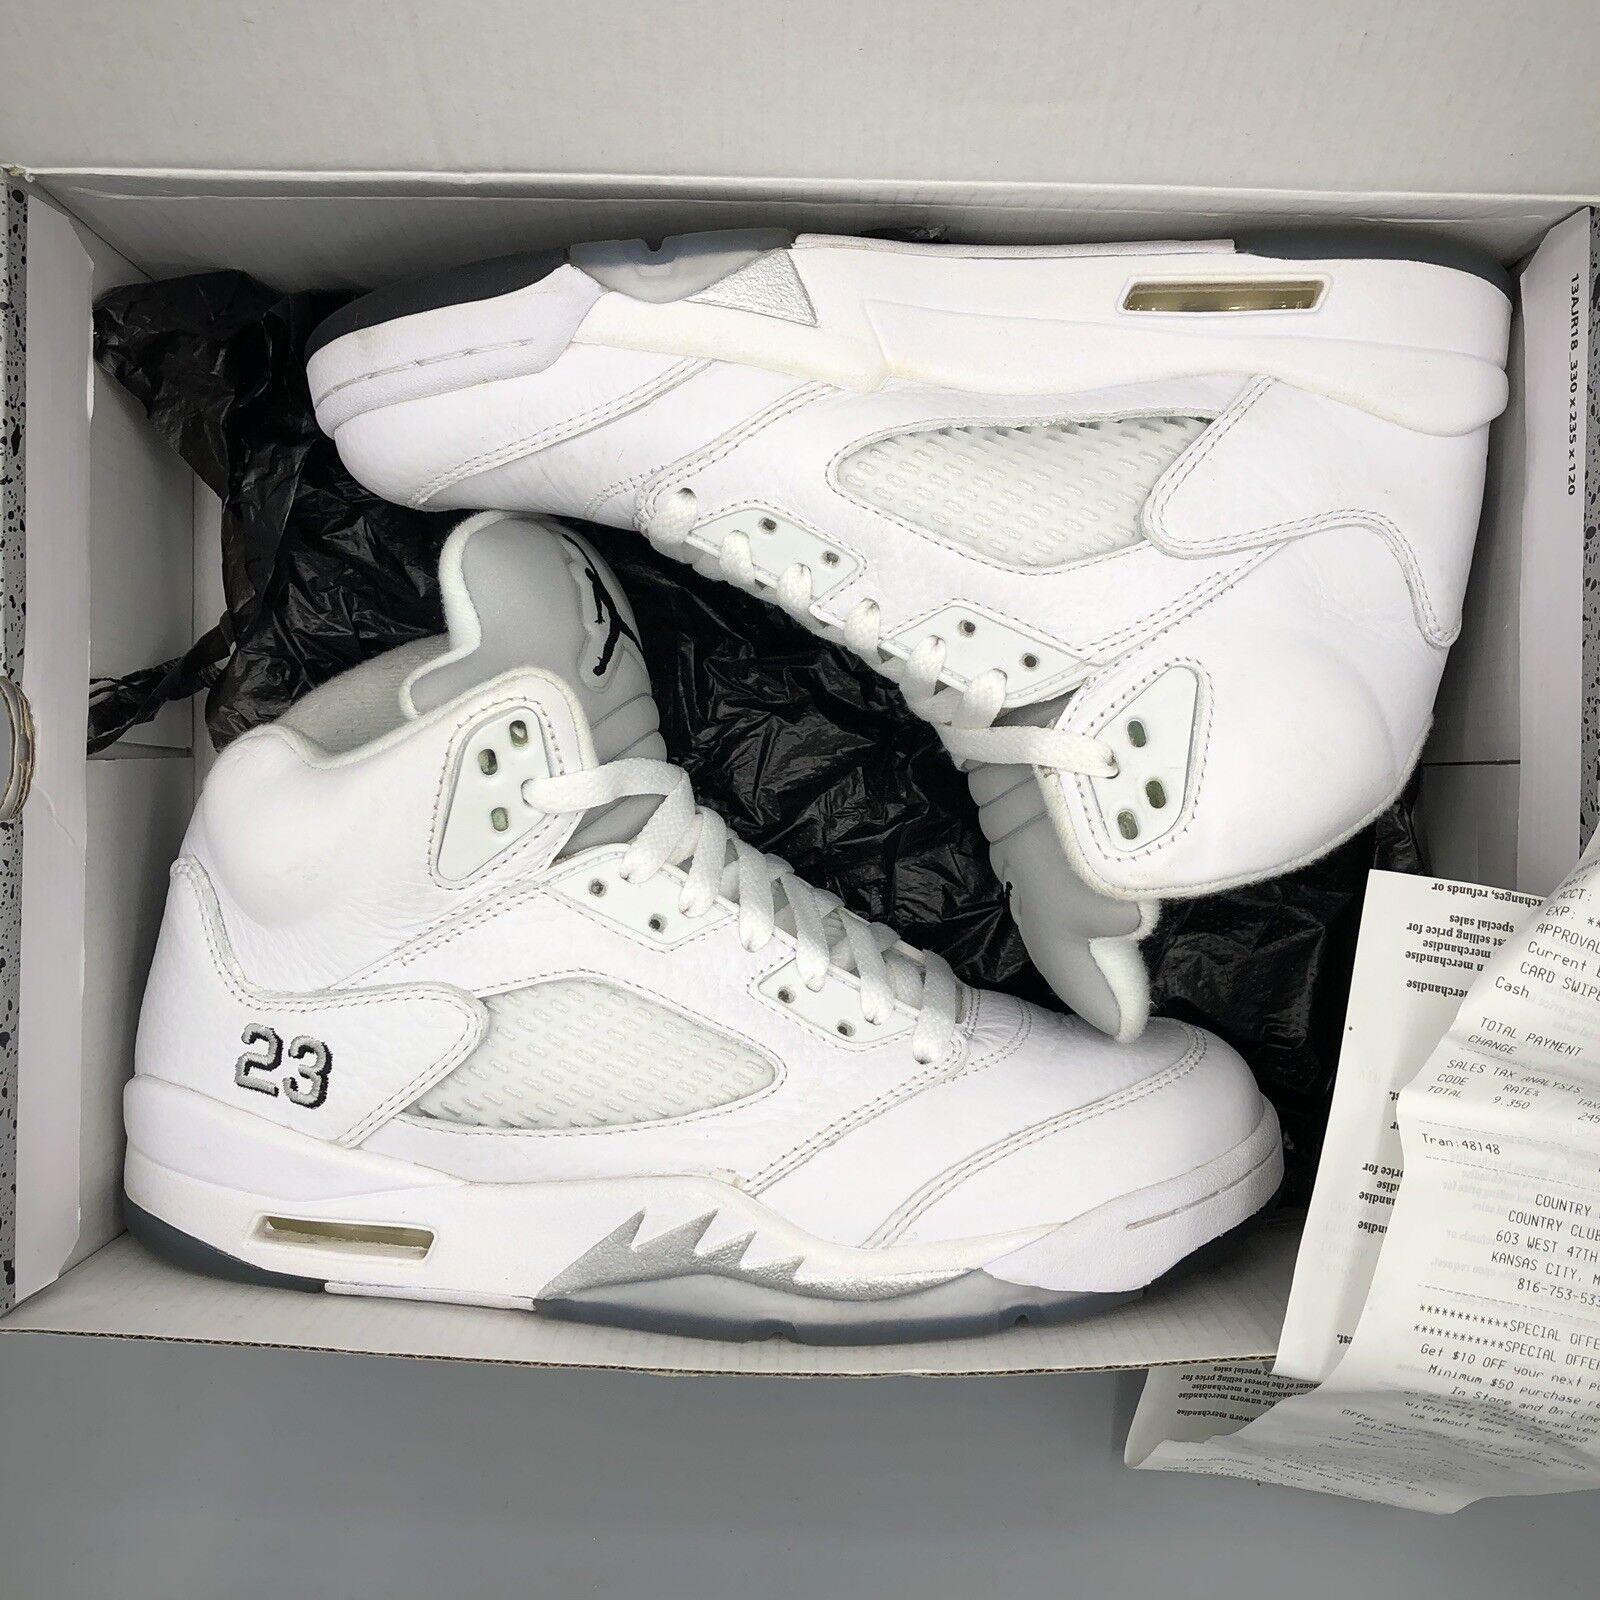 sports shoes f5b17 c1e93 Nike Air Jordan Retro Retro Retro V White Metallic Silver Size 7.5 136027  130 Black XI